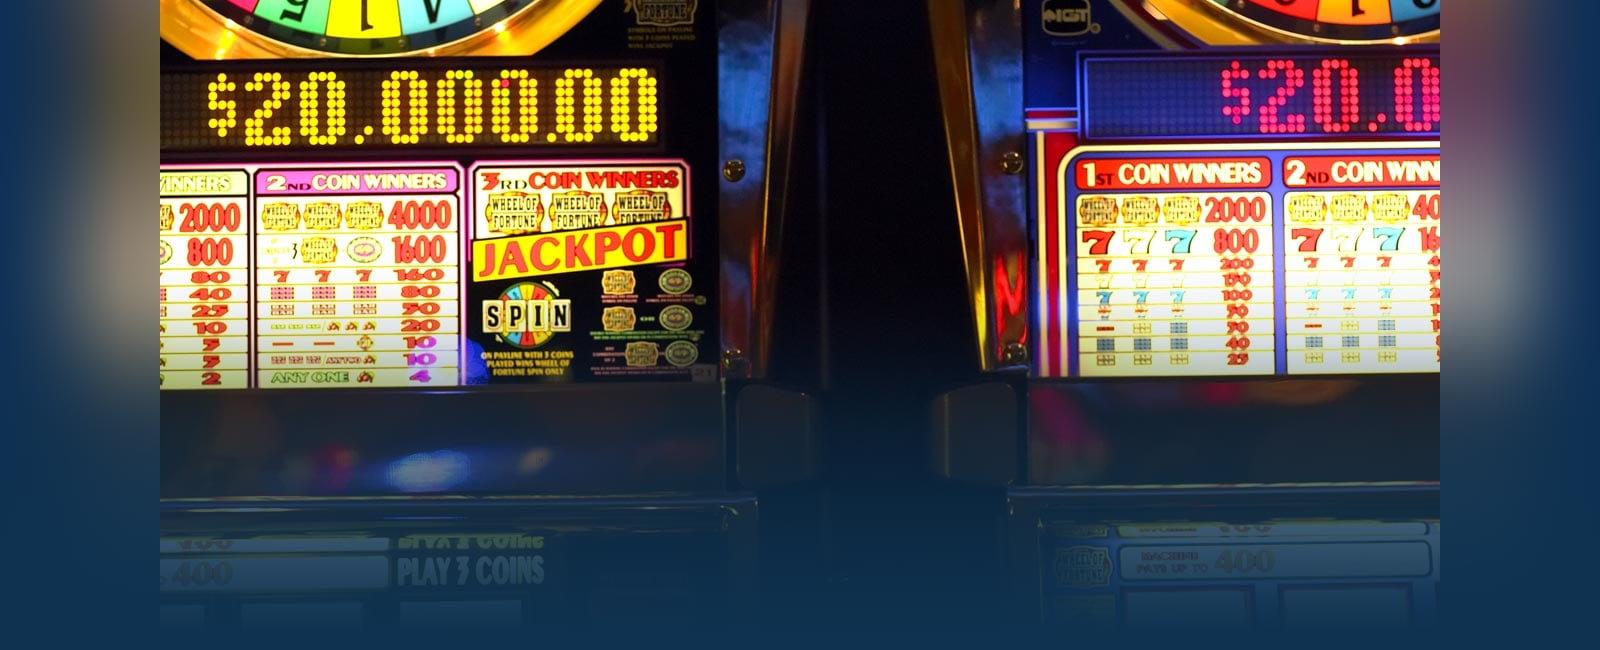 Gambling cruises in new england